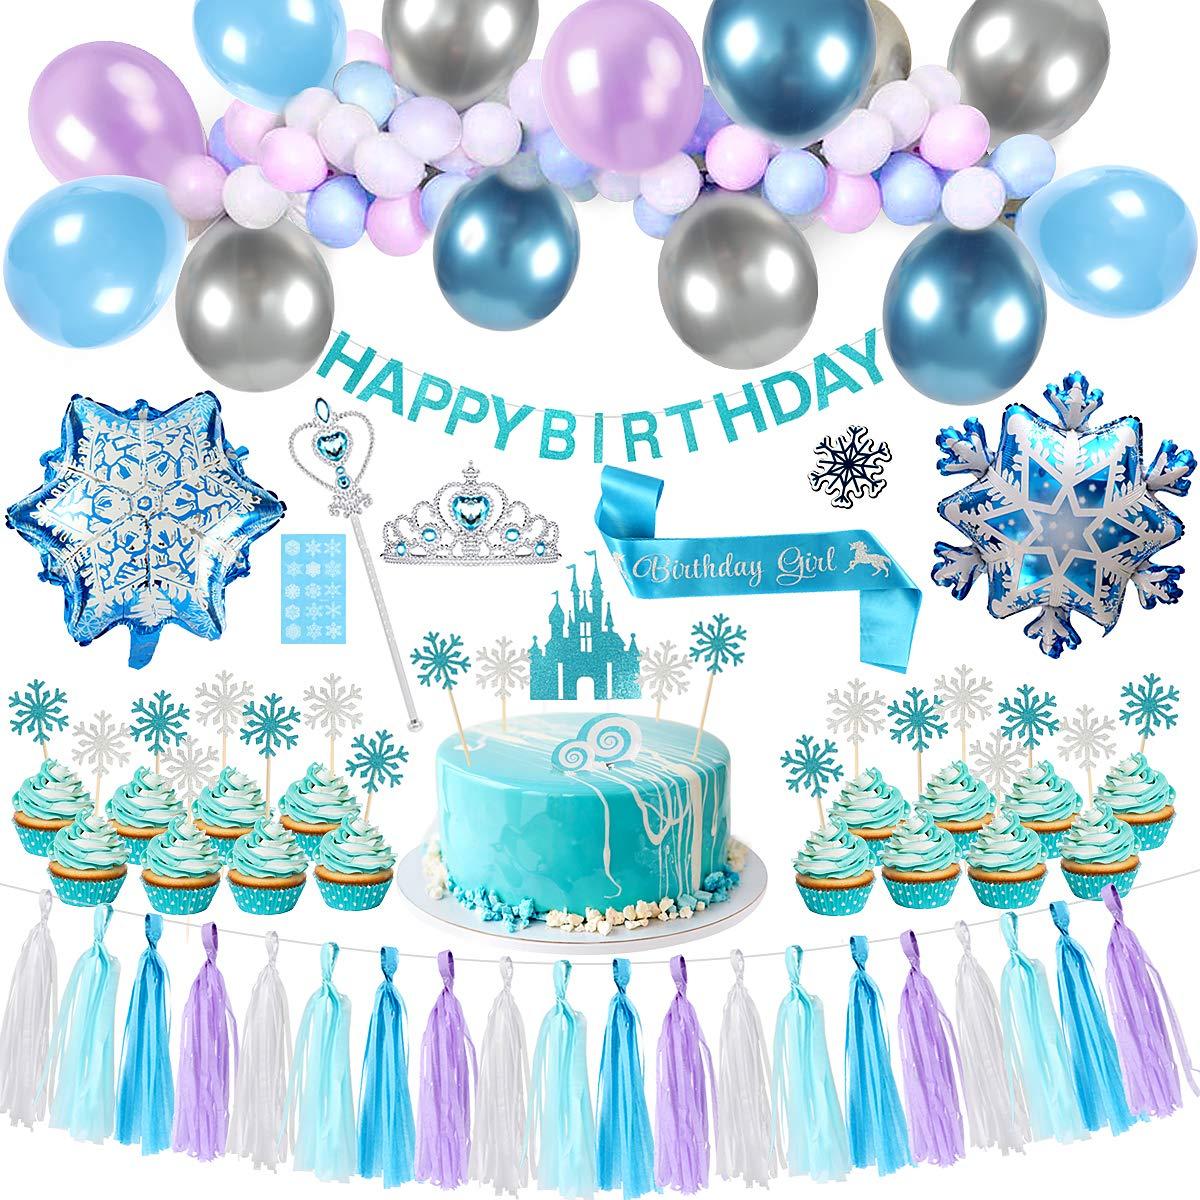 YiRAN Frozen Balloon Garland Arch Kit 16Ft Long Frozen Birthday Party Supplies